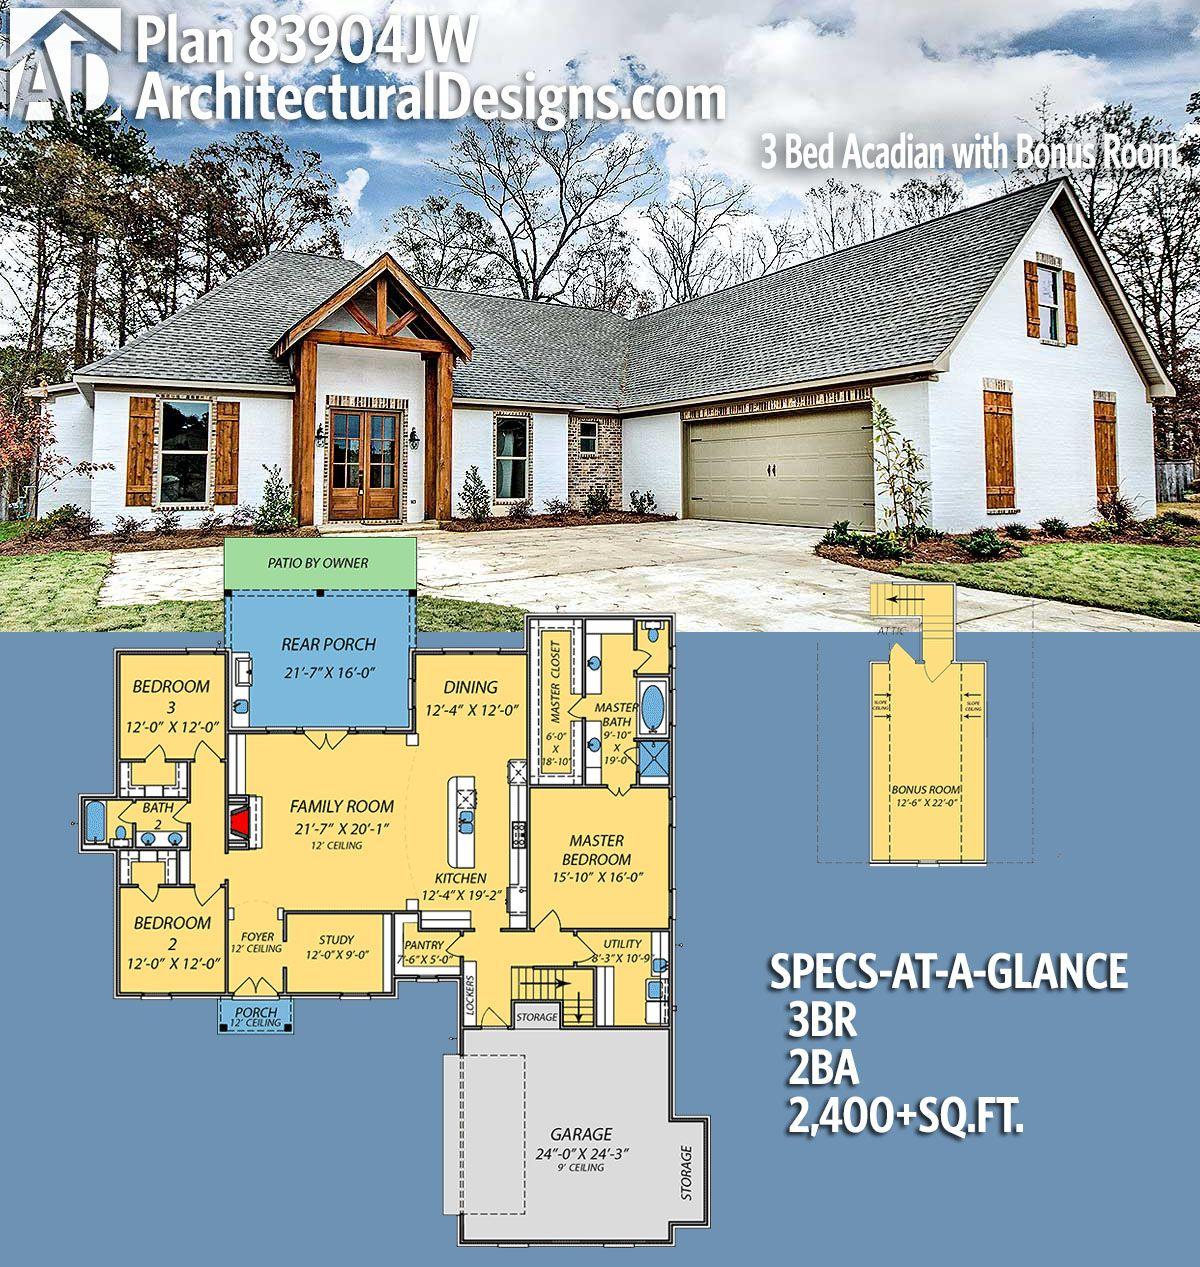 Plan 83904jw Exclusive Acadian House Plan With Bonus Room